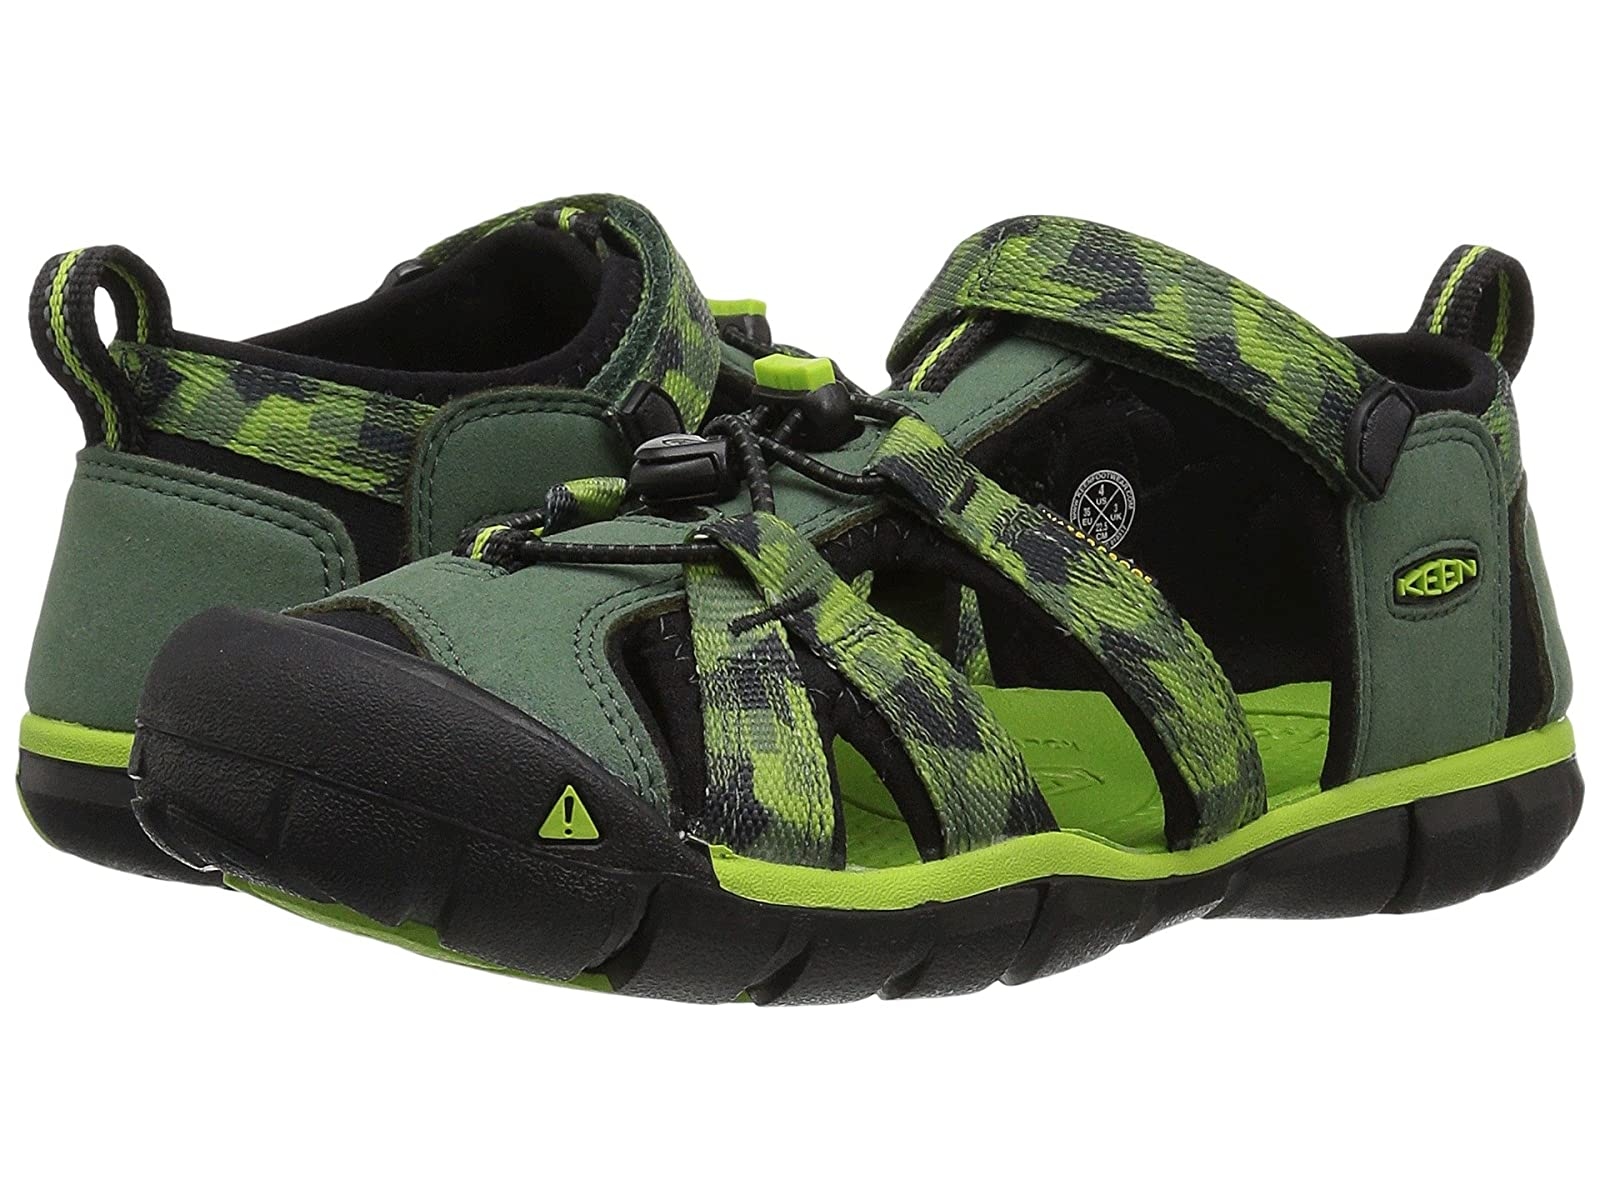 Keen Kids Seacamp II CNX (Little Kid/Big Kid)Cheap and distinctive eye-catching shoes